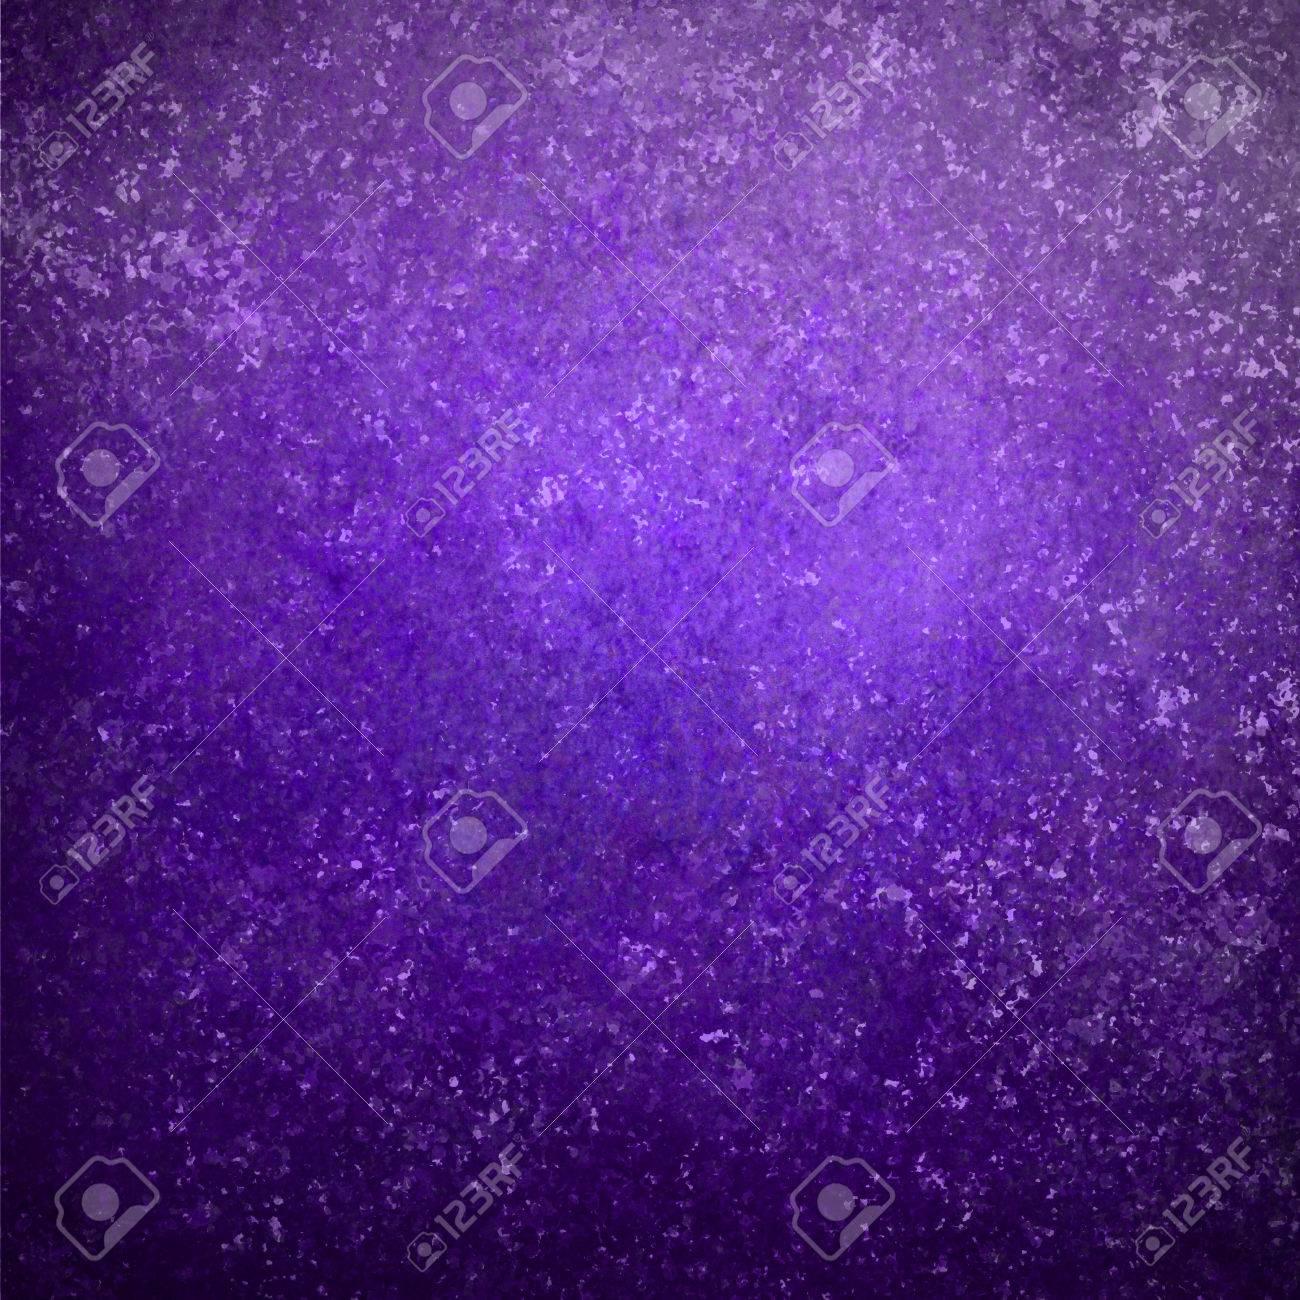 Old Vintage Purple Background Illustration Distressed Old Texture